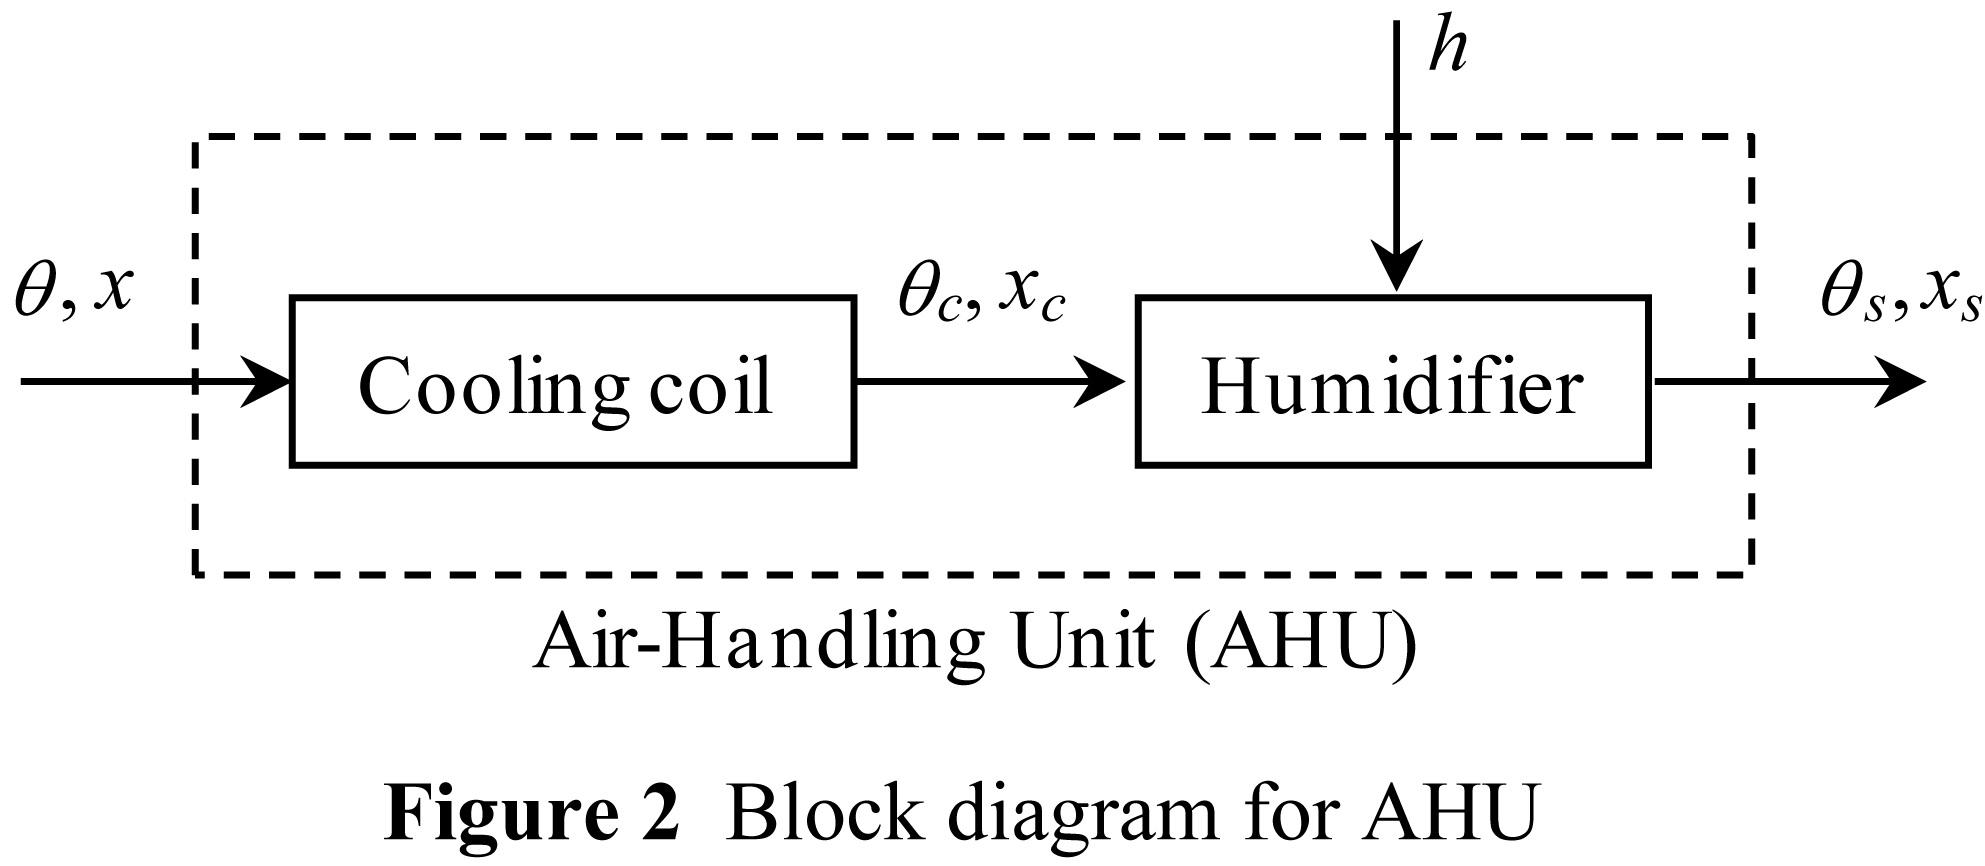 hight resolution of figure 2 block diagram